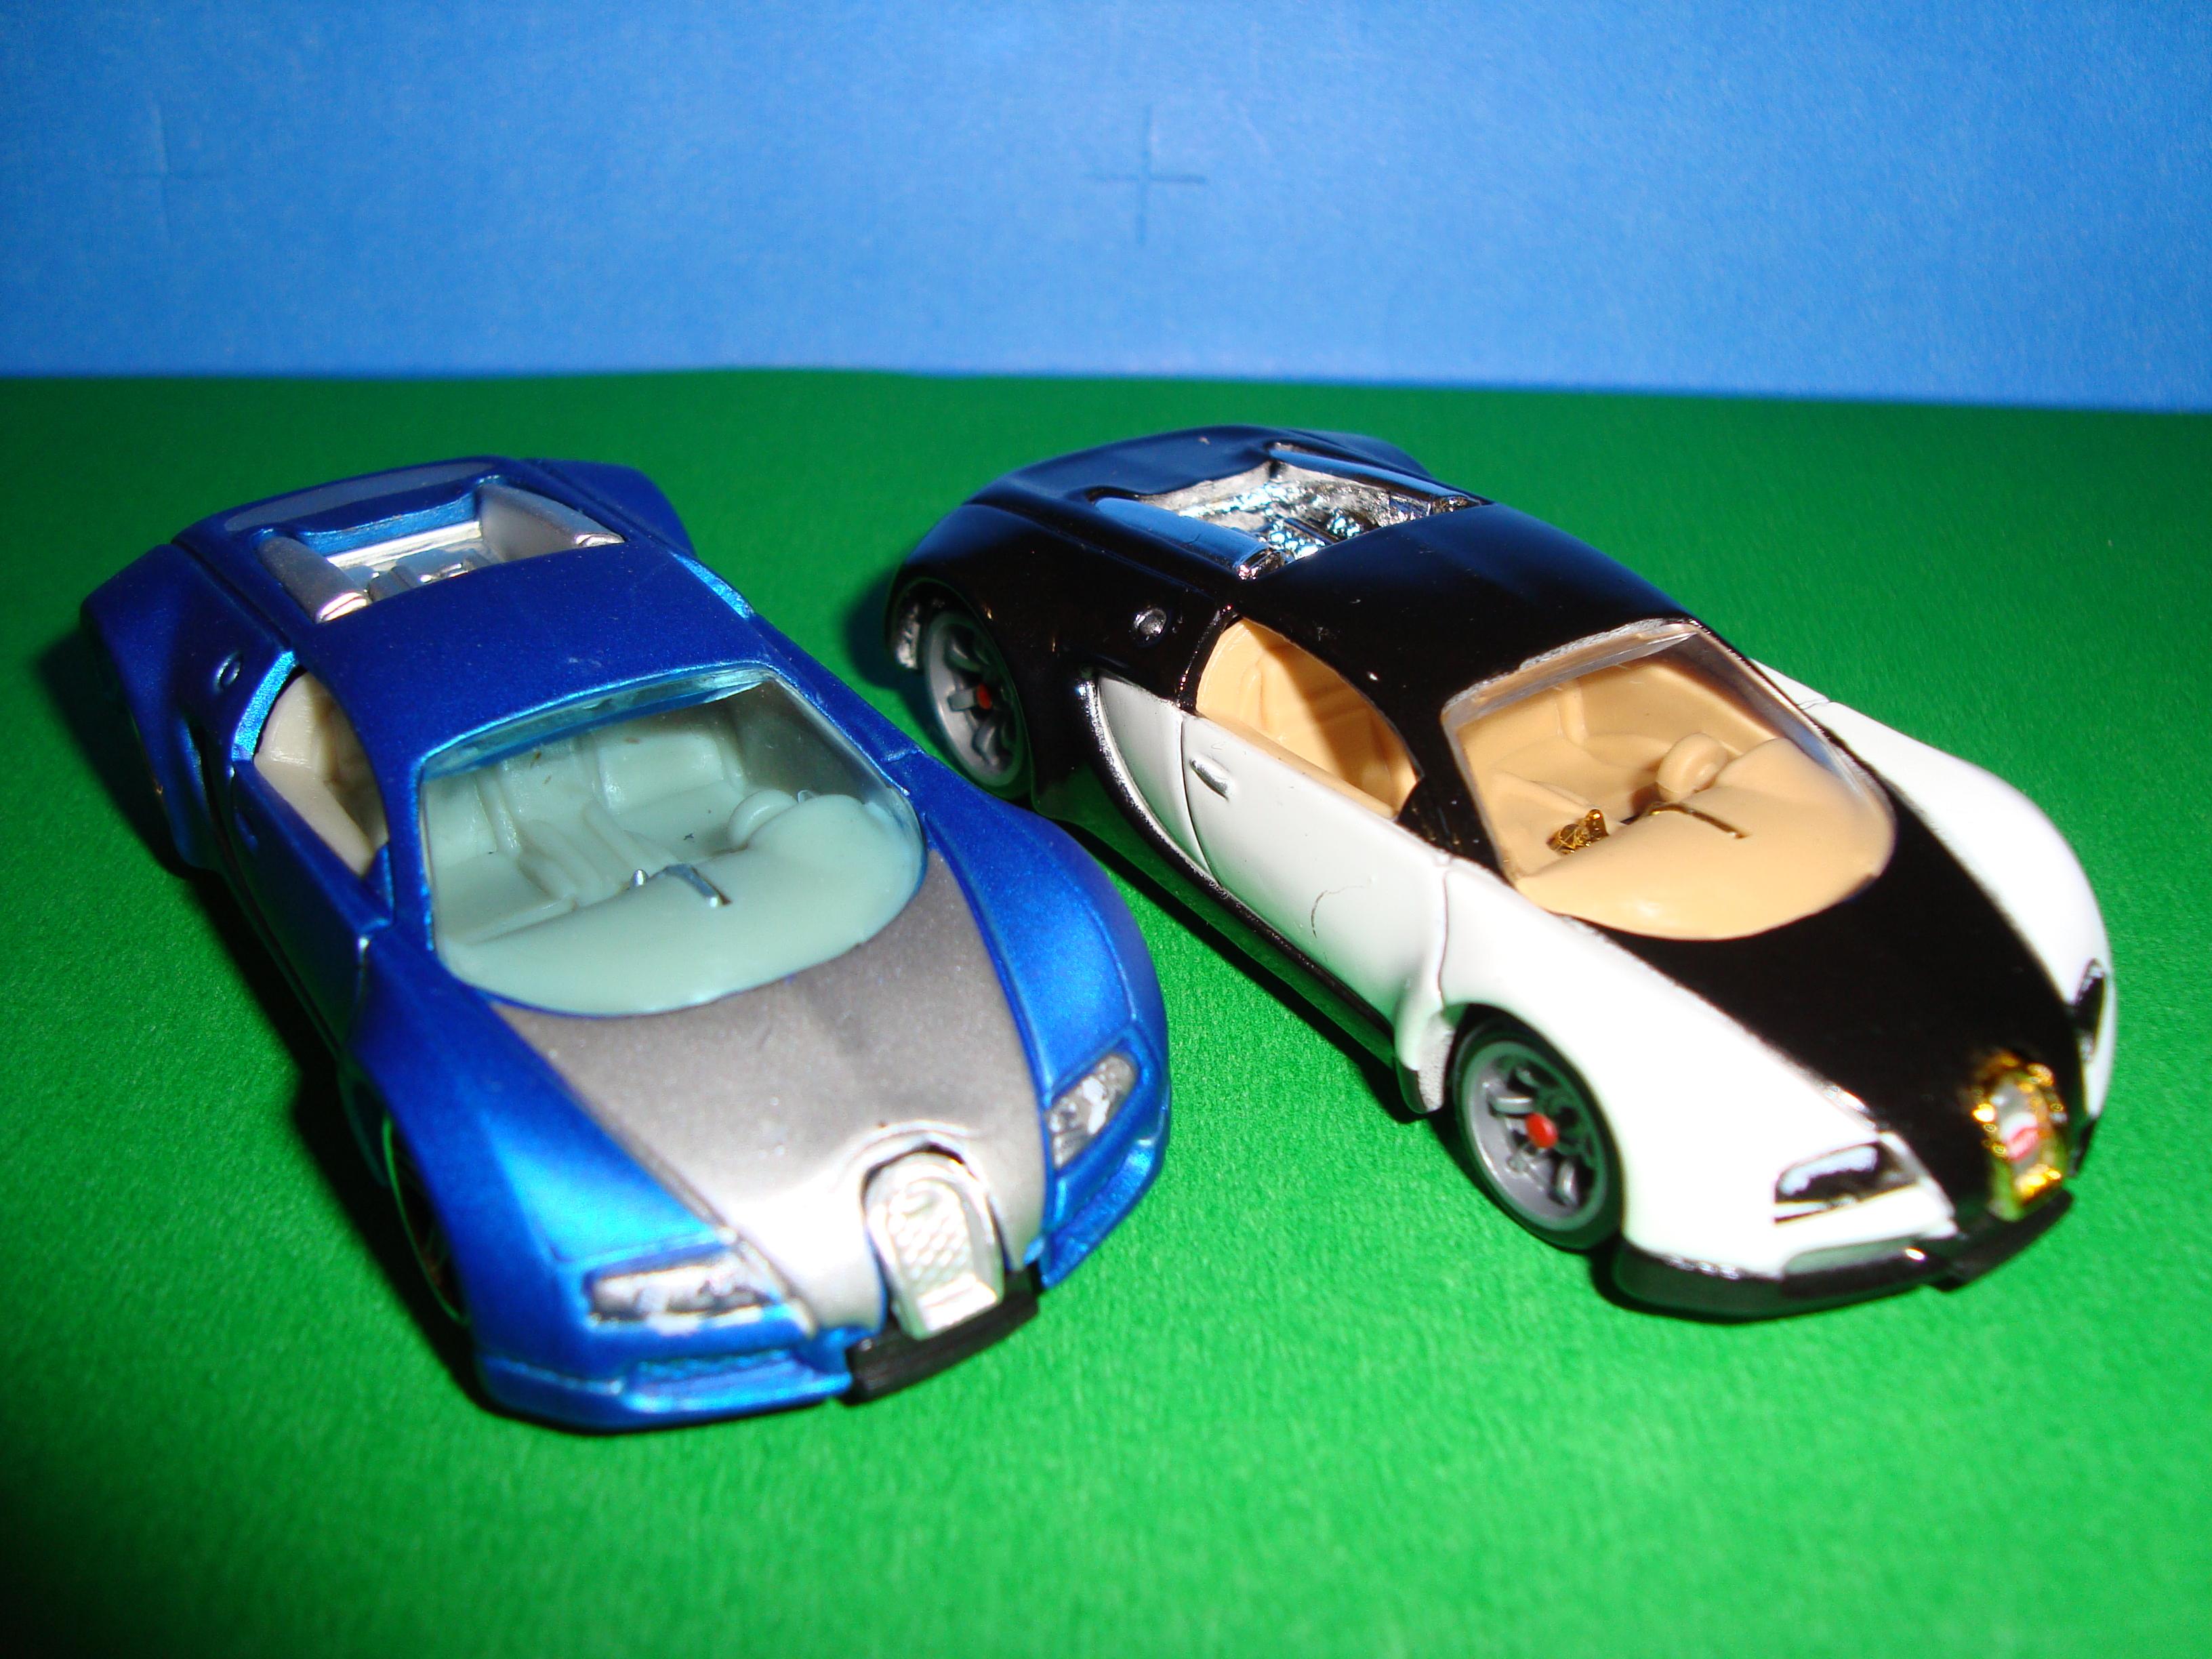 bugatti veyron hotwheels speed machines 2010 r8483 0718. Black Bedroom Furniture Sets. Home Design Ideas